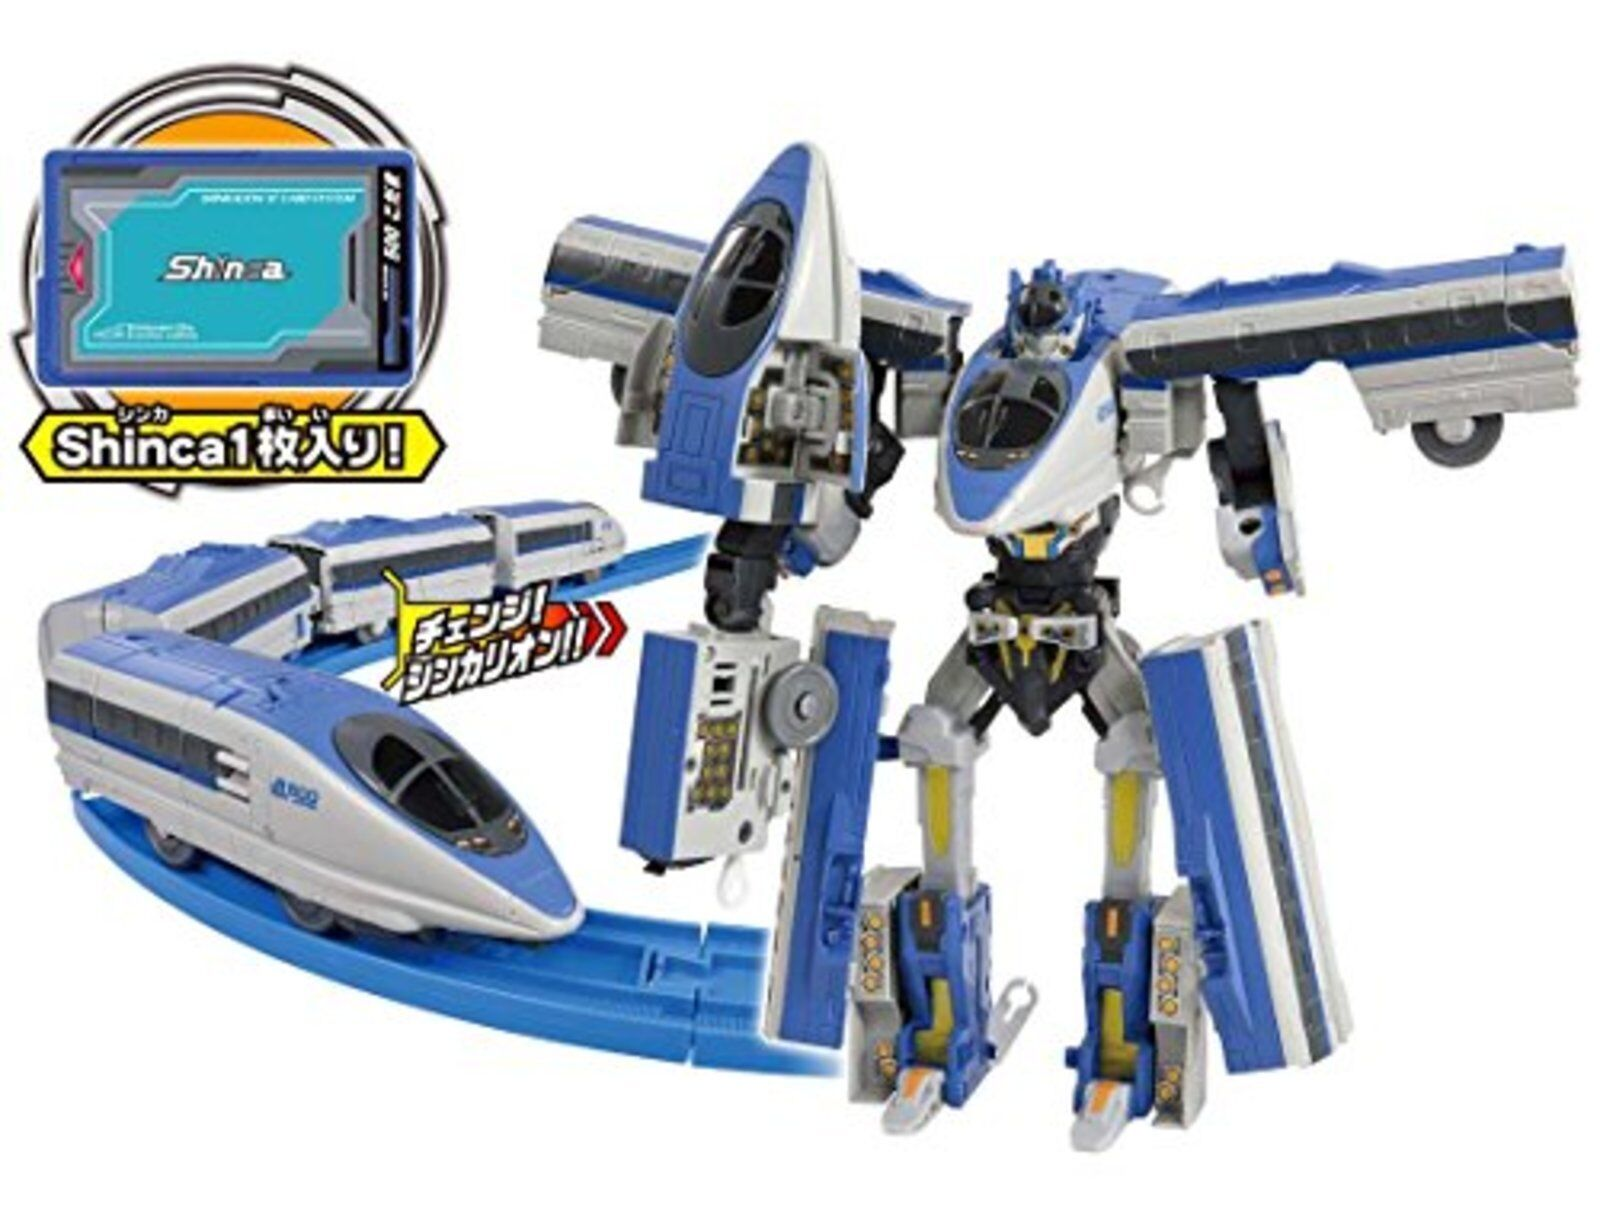 Pla-Rail Shinkansen Deformation Robot Shinkalion Dxs09 500 Kodama F S W